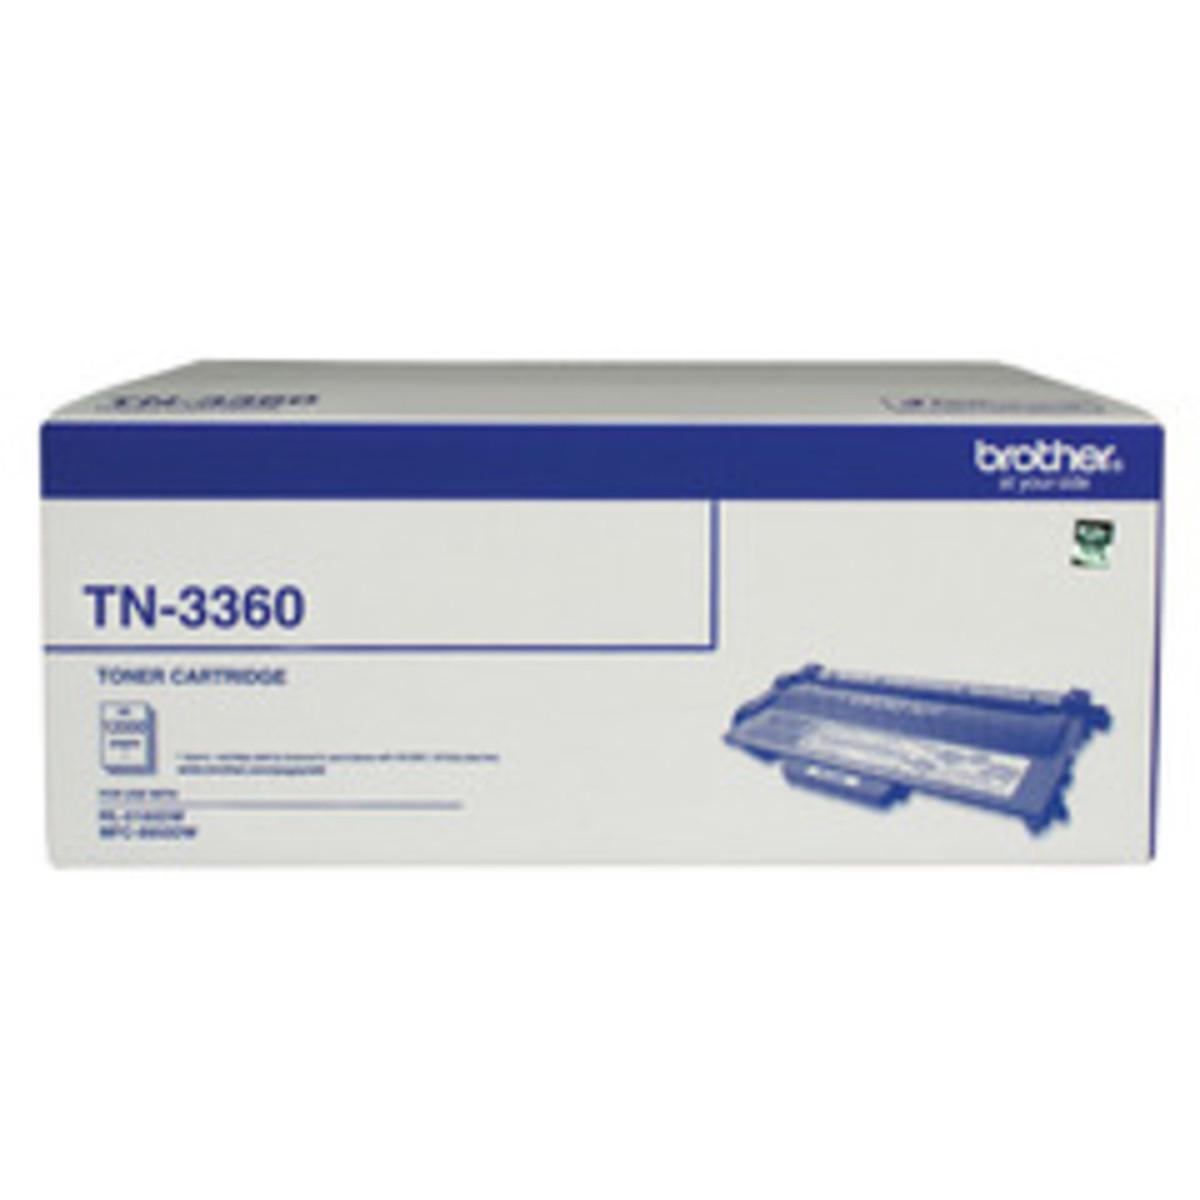 Brother TN-3360 Black Toner Cartridge